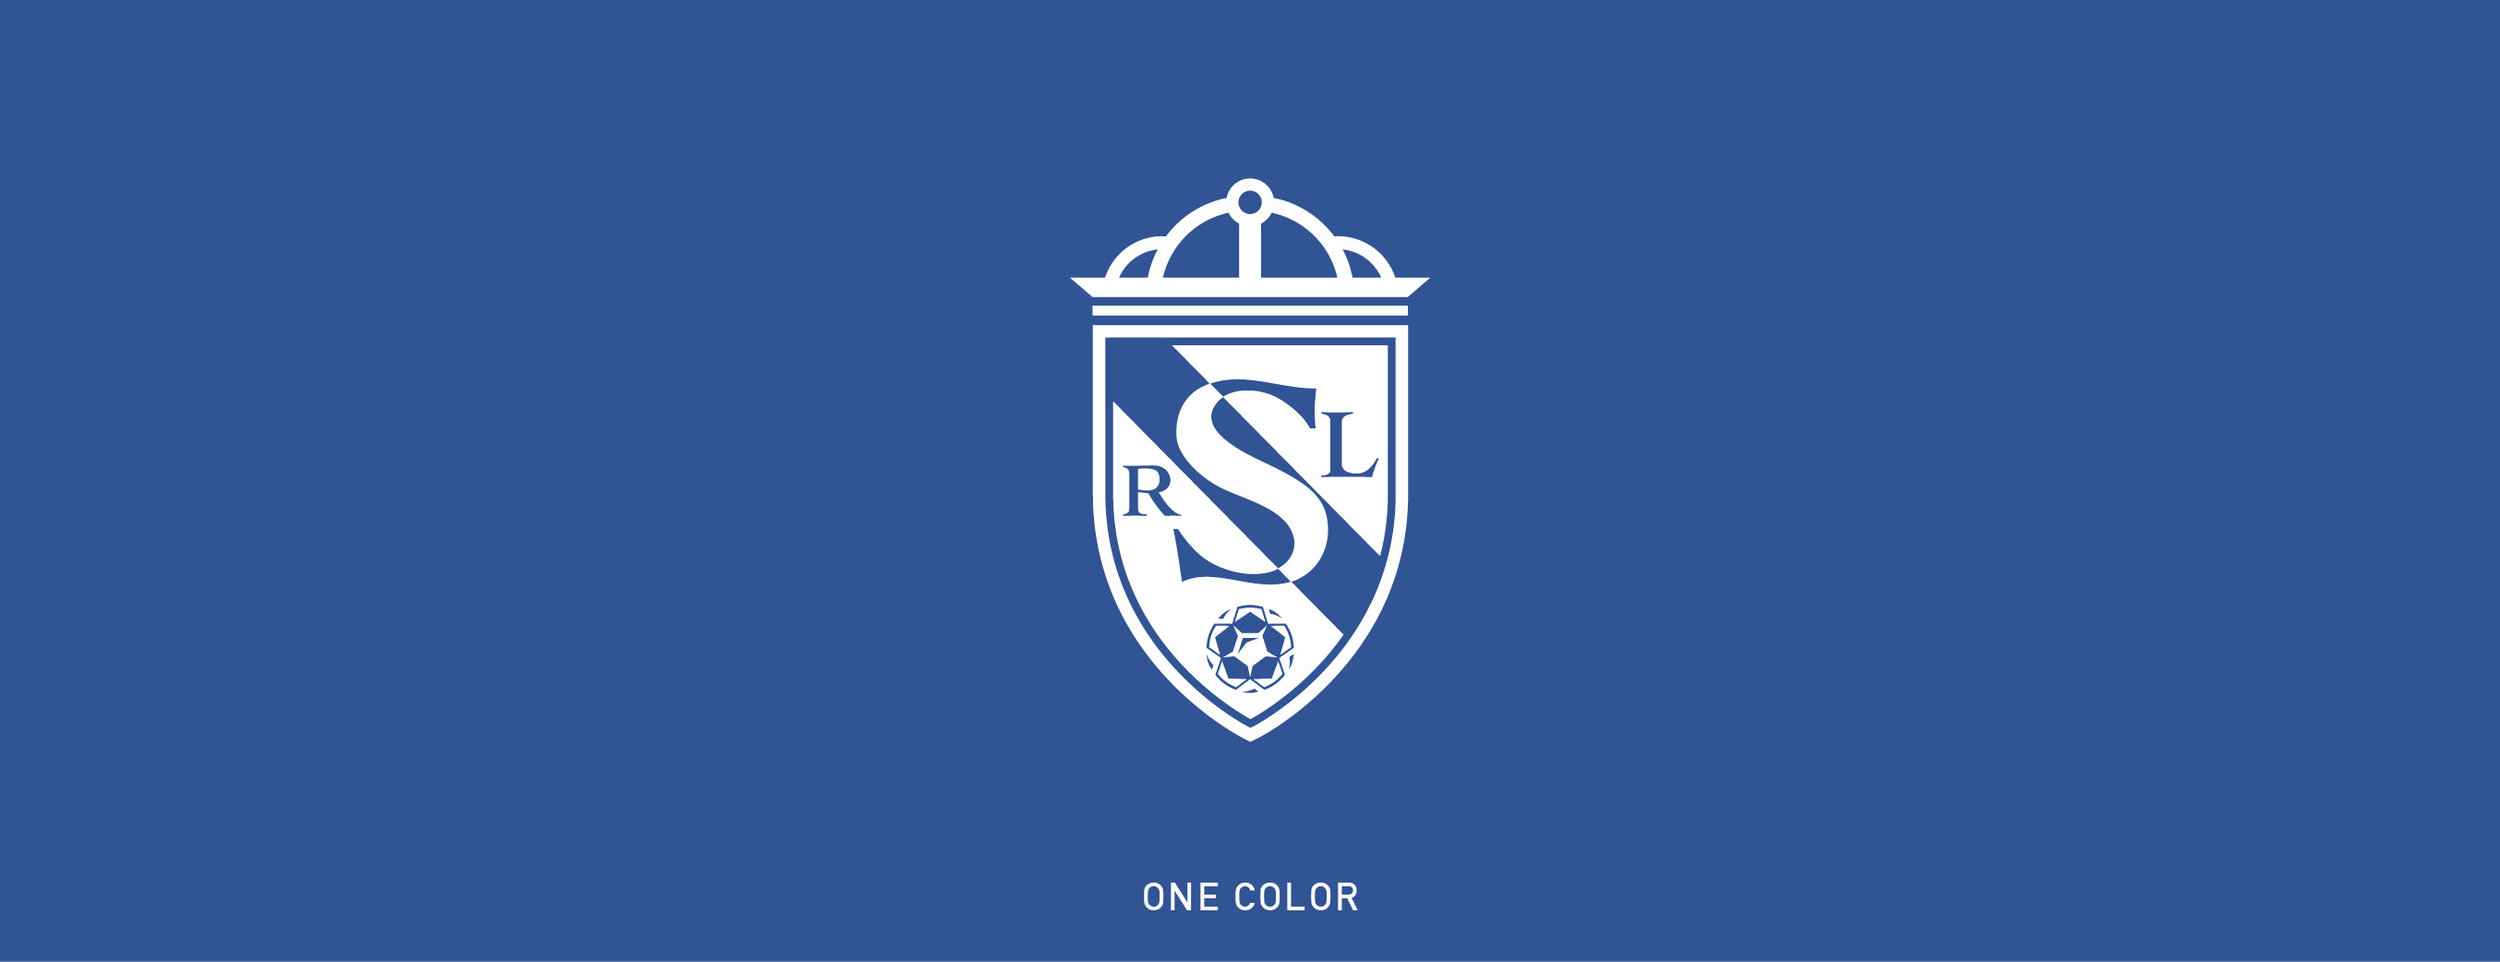 RSL - Rebrand5.jpg